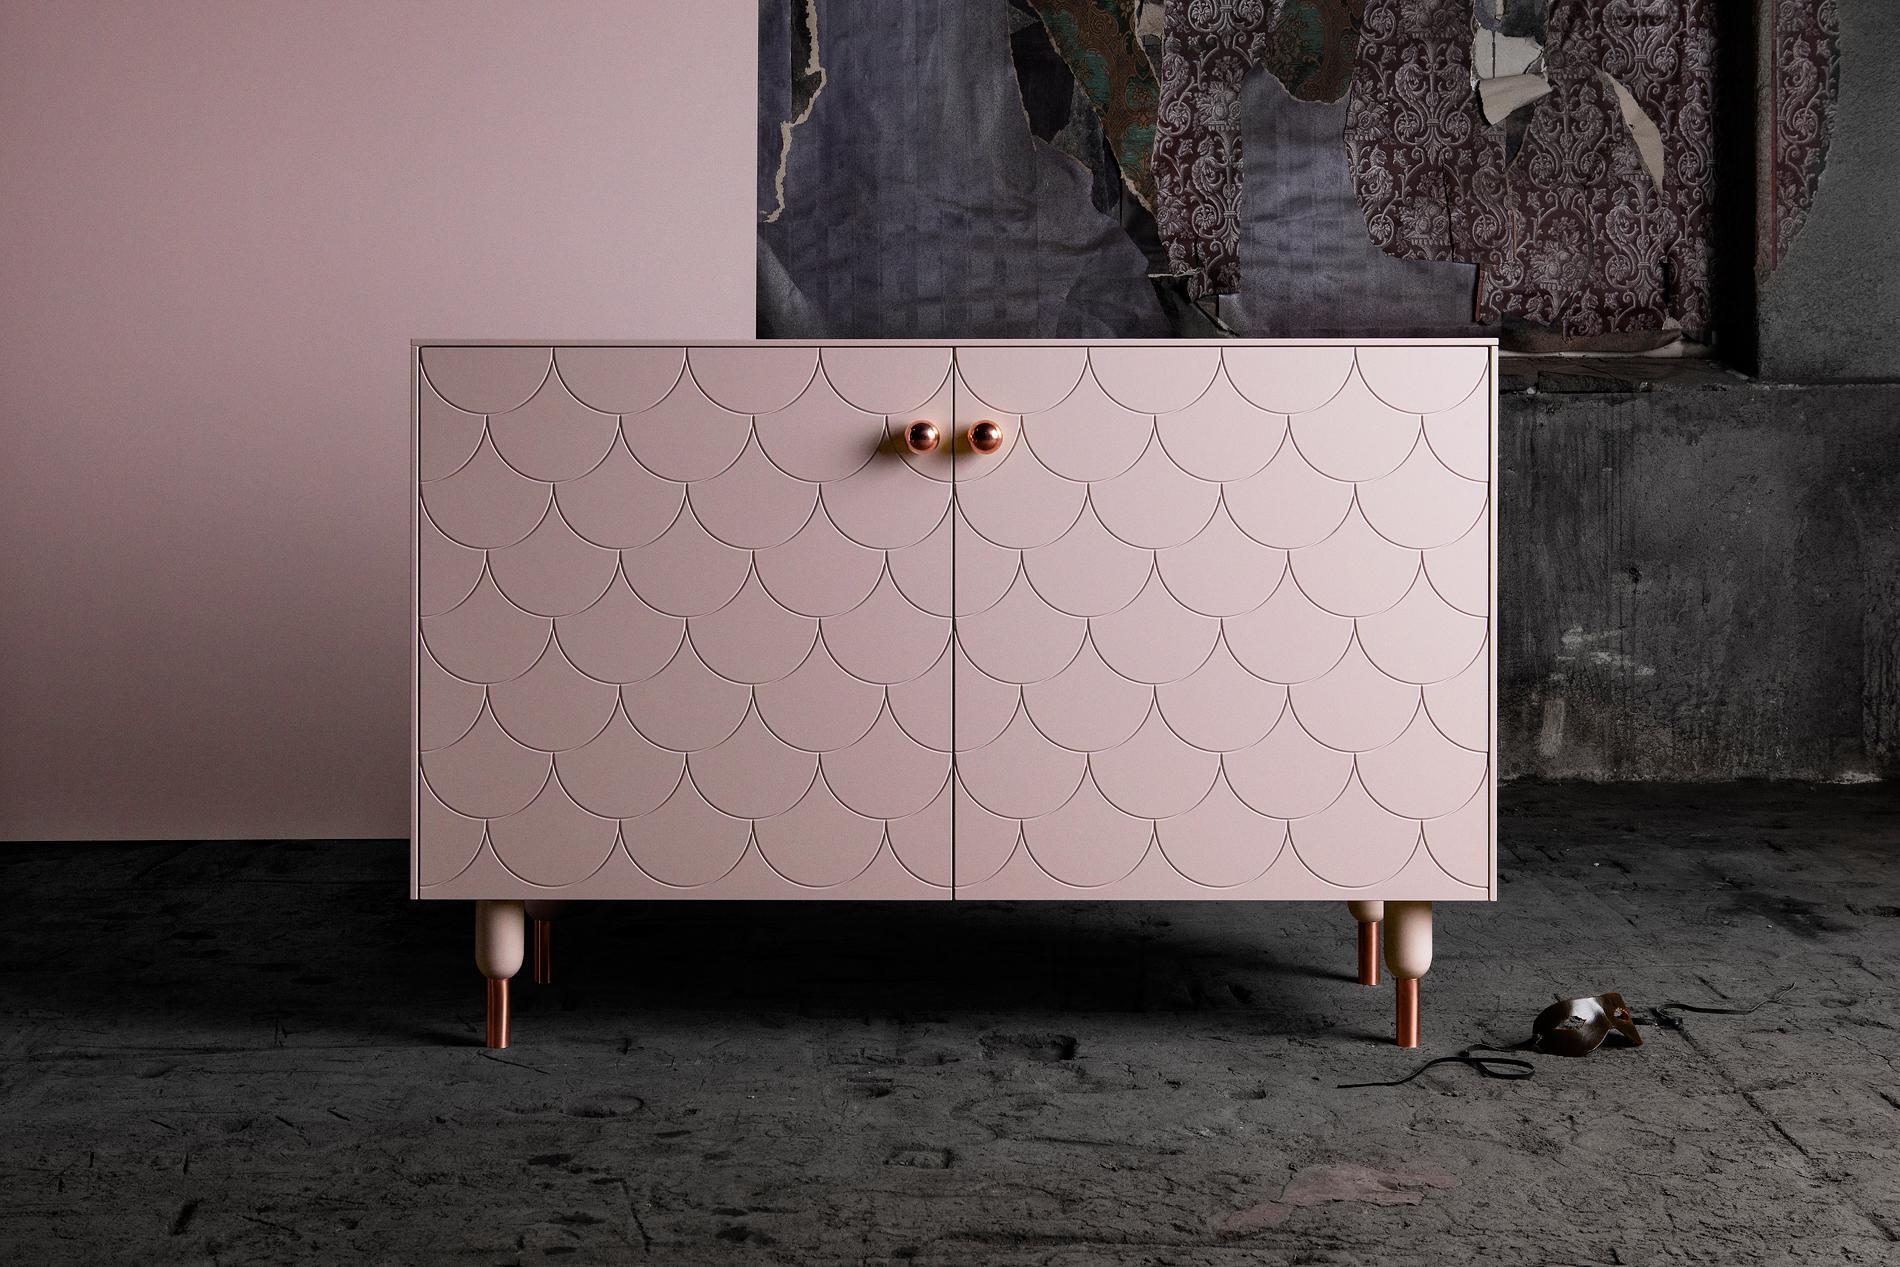 Meuble Tv Colonne Ikea dix conseils pour customiser ses meubles ikea - madame figaro